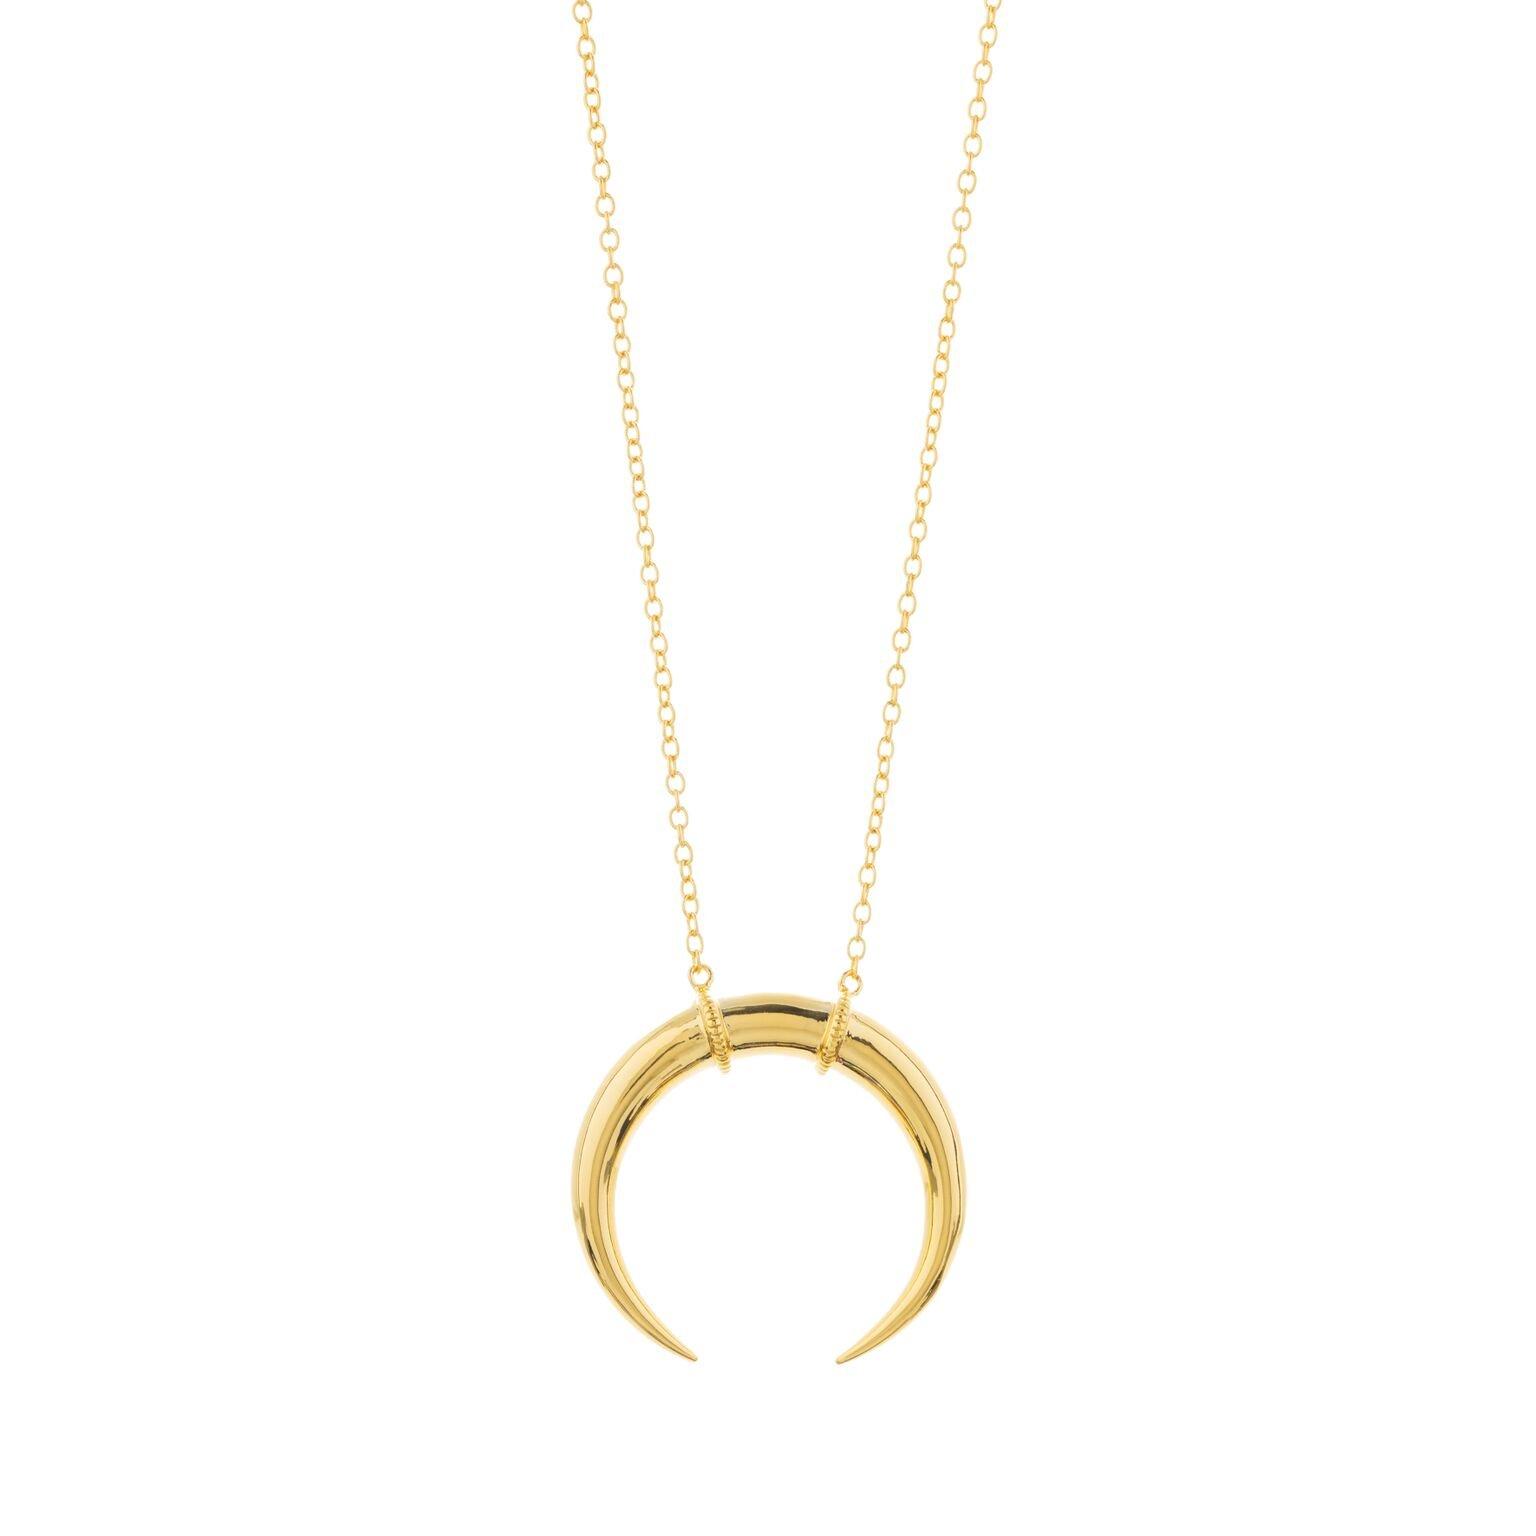 Gorjana Women's Cayne Crescent Pendant Necklace - 18k Gold Plated - Moon Pendant Necklace - Modern Style